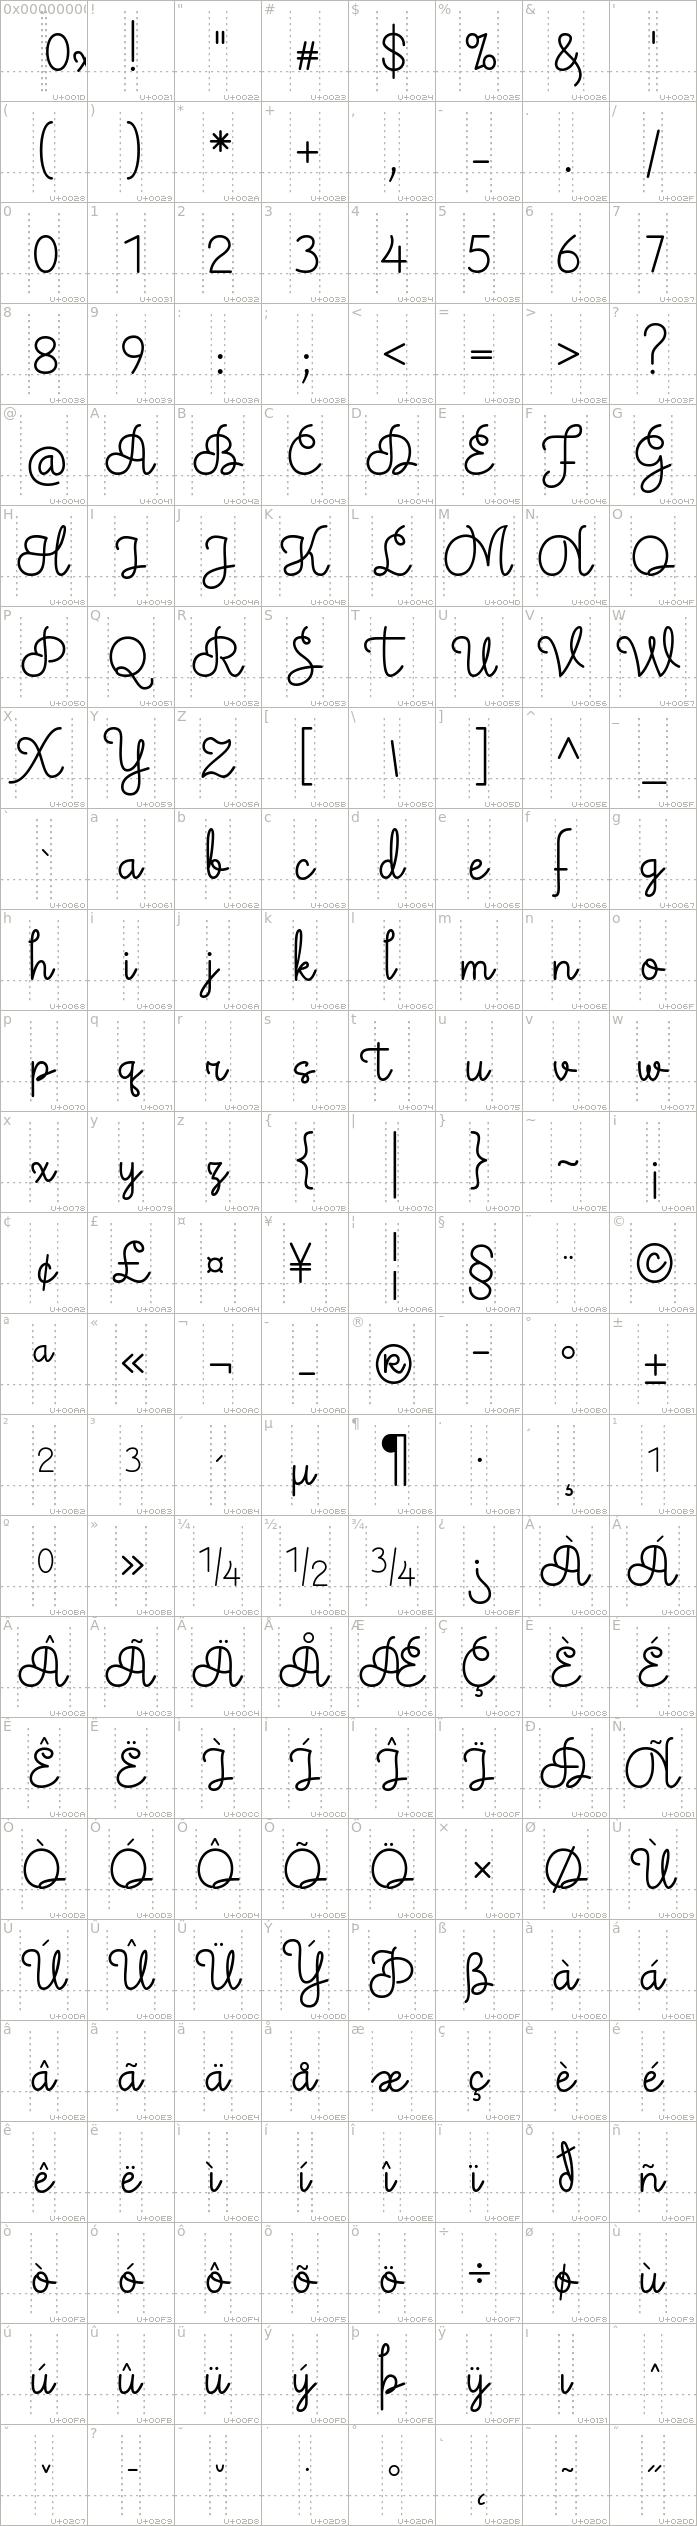 theodista-decally.regular.character-map-1